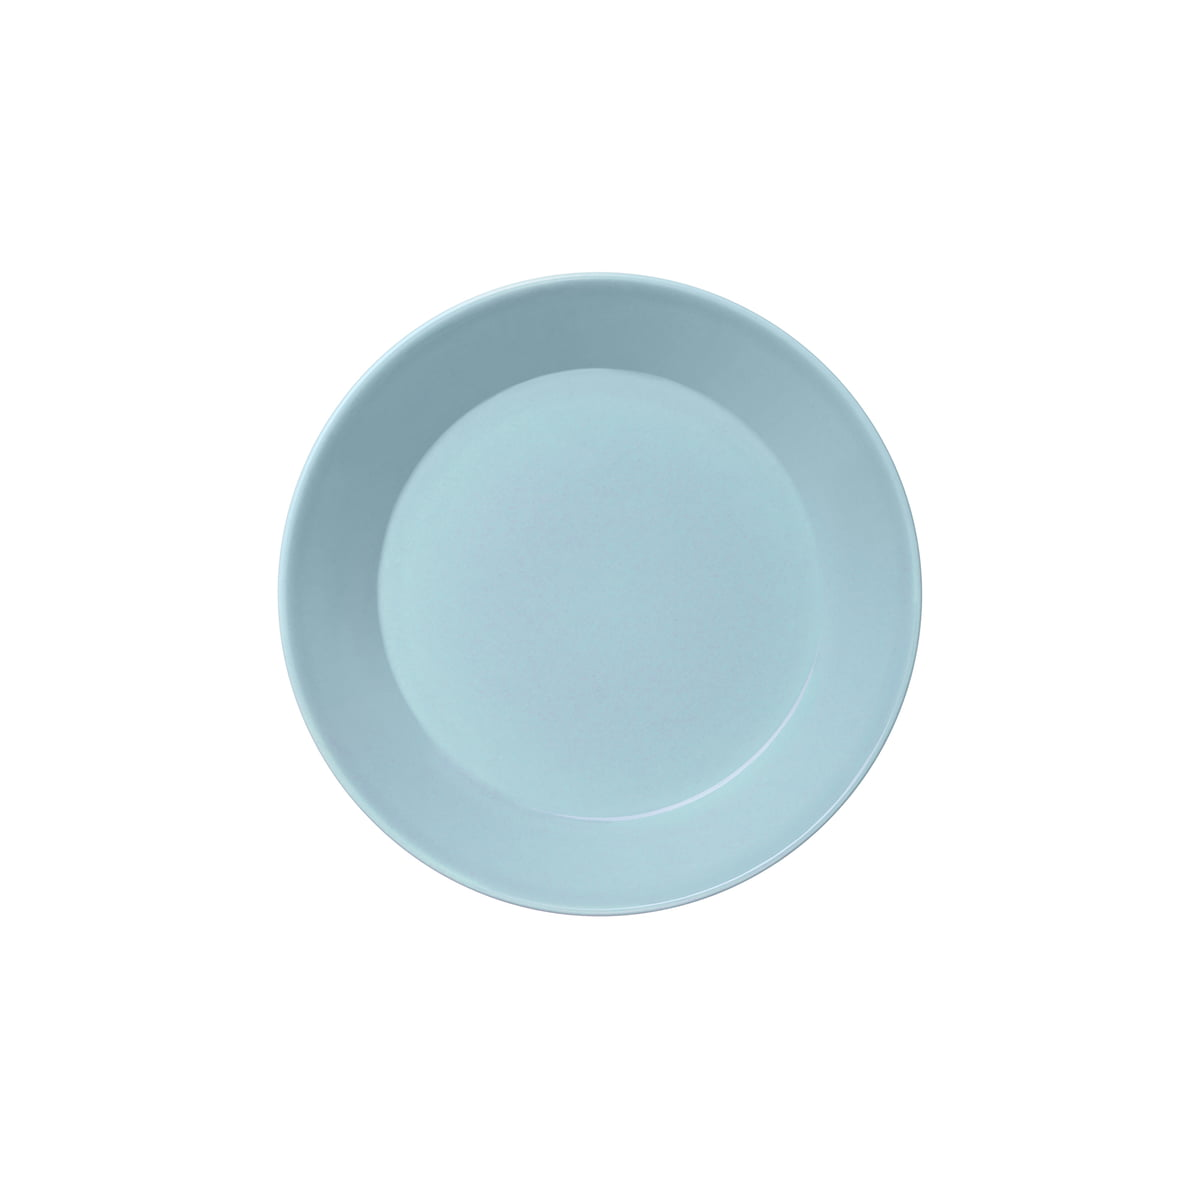 Iittala Teema in light blue in our shop